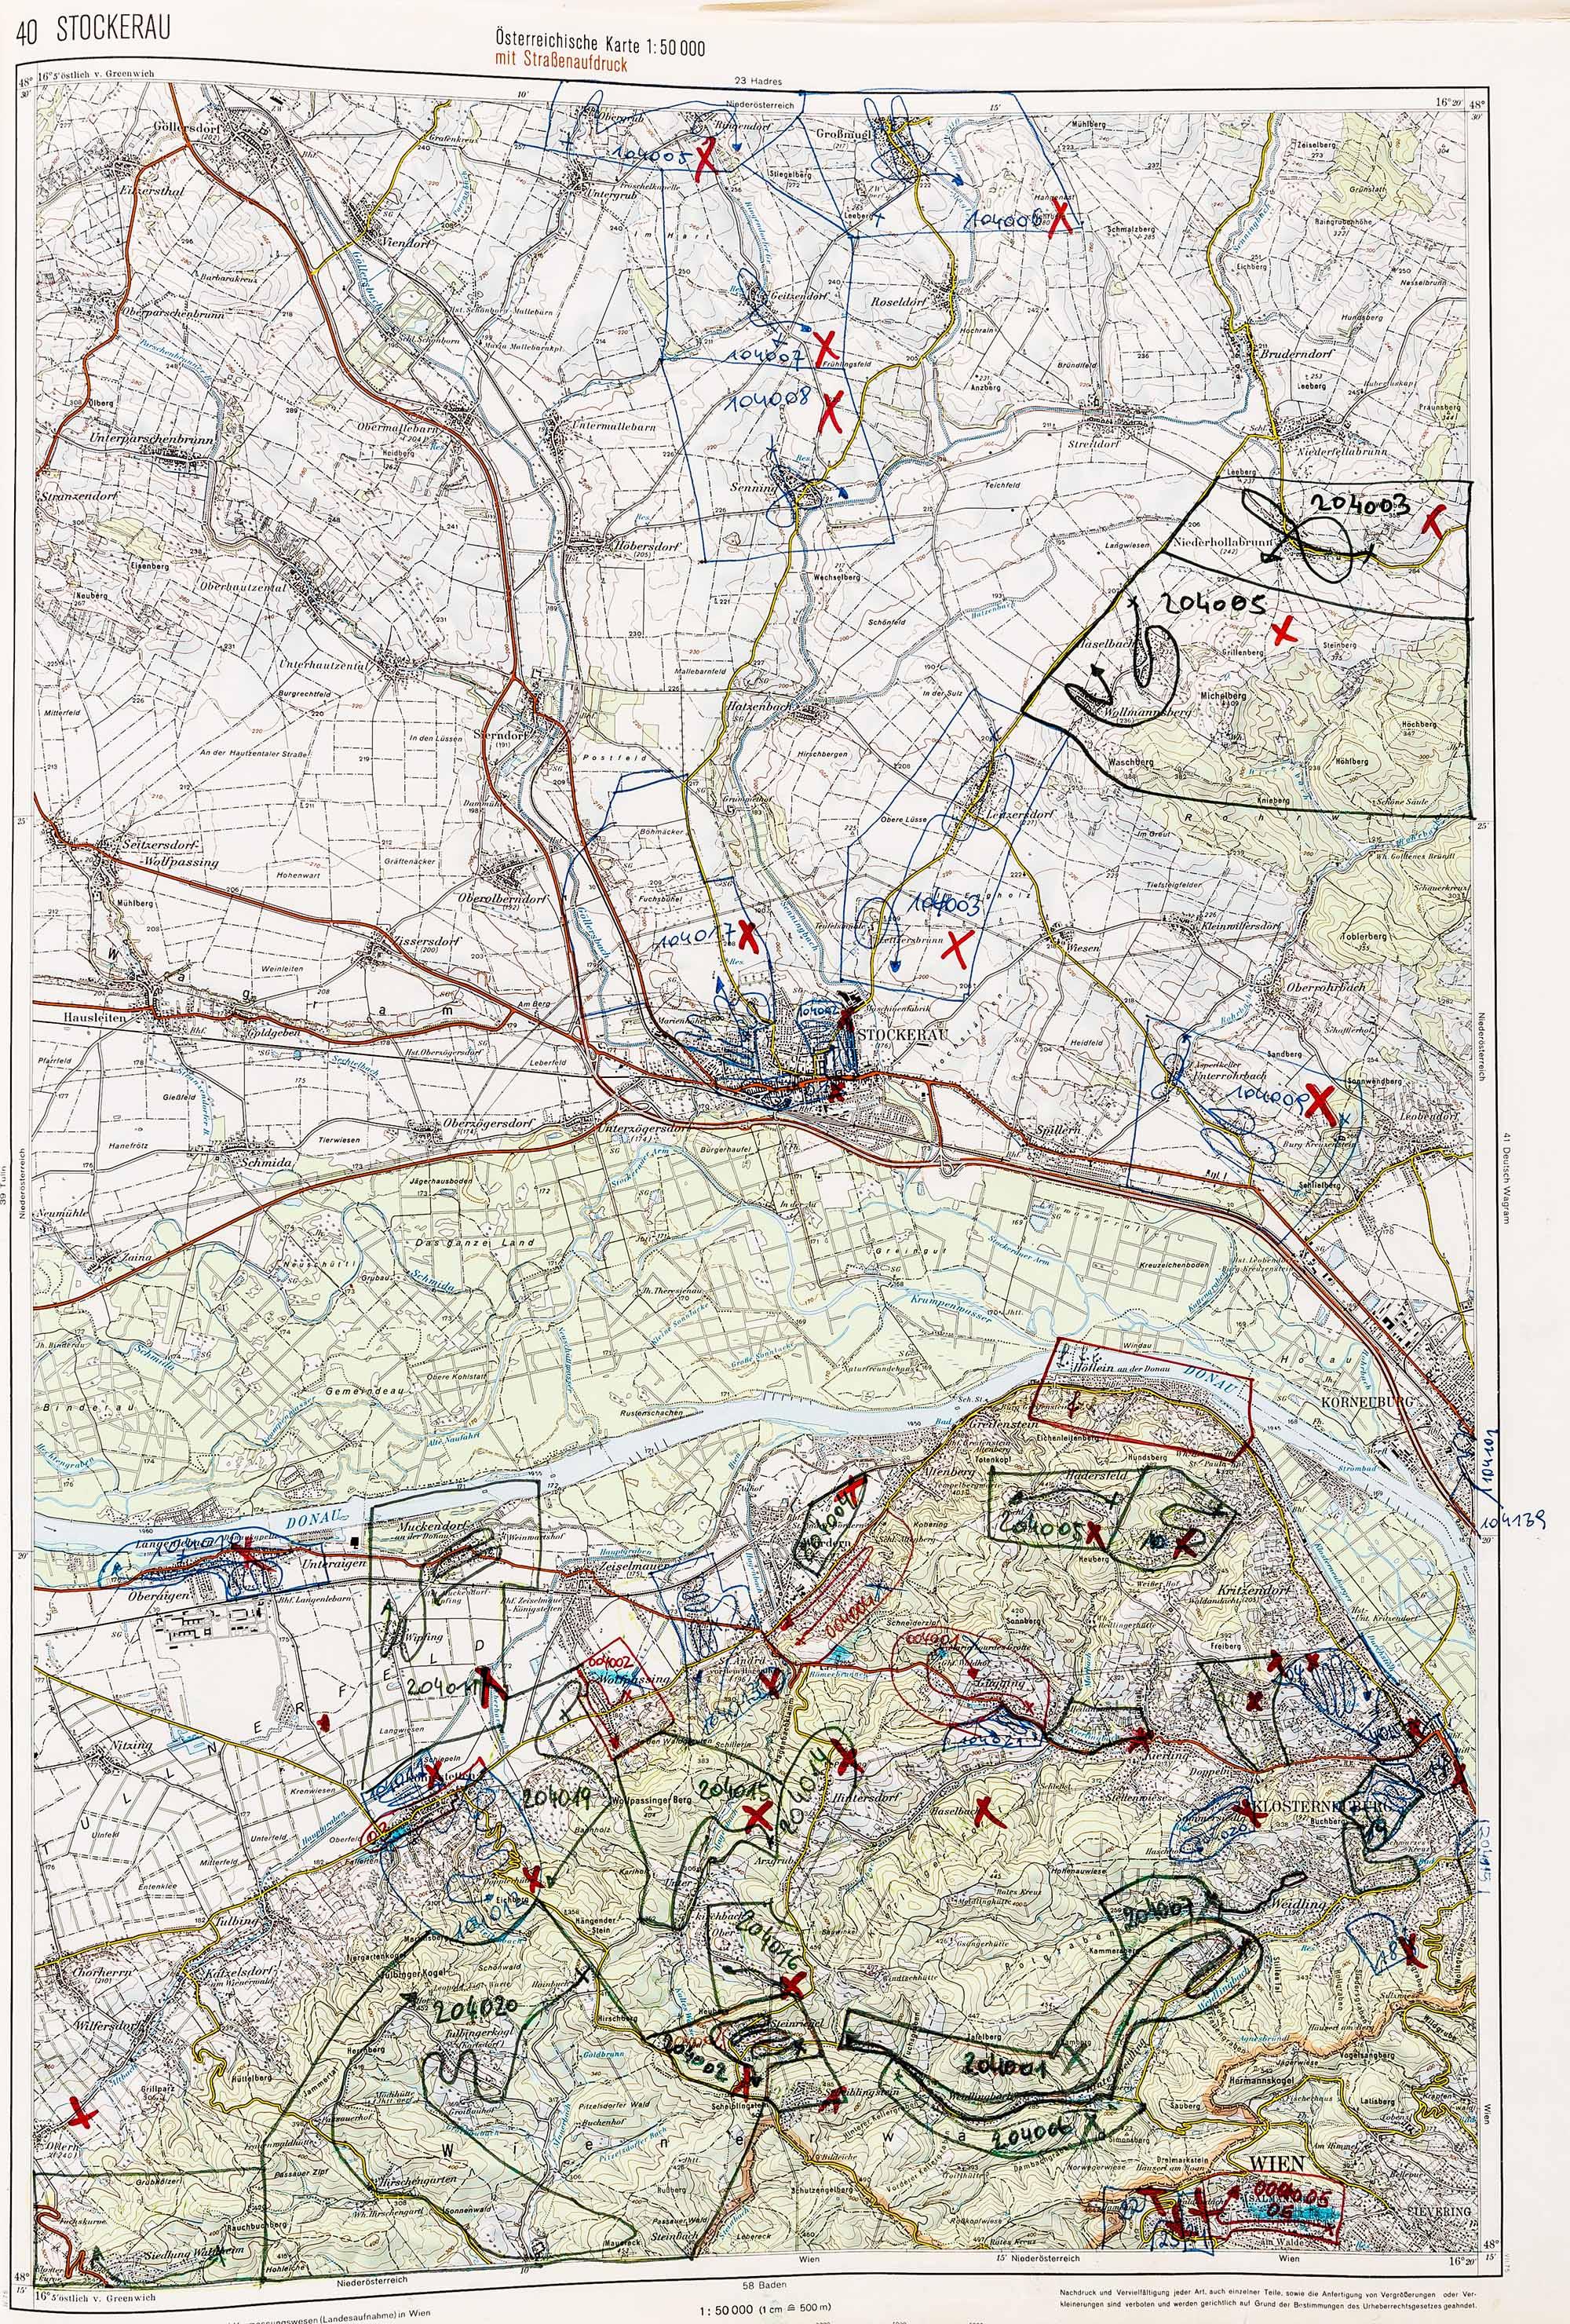 1979-1982 Karte 040